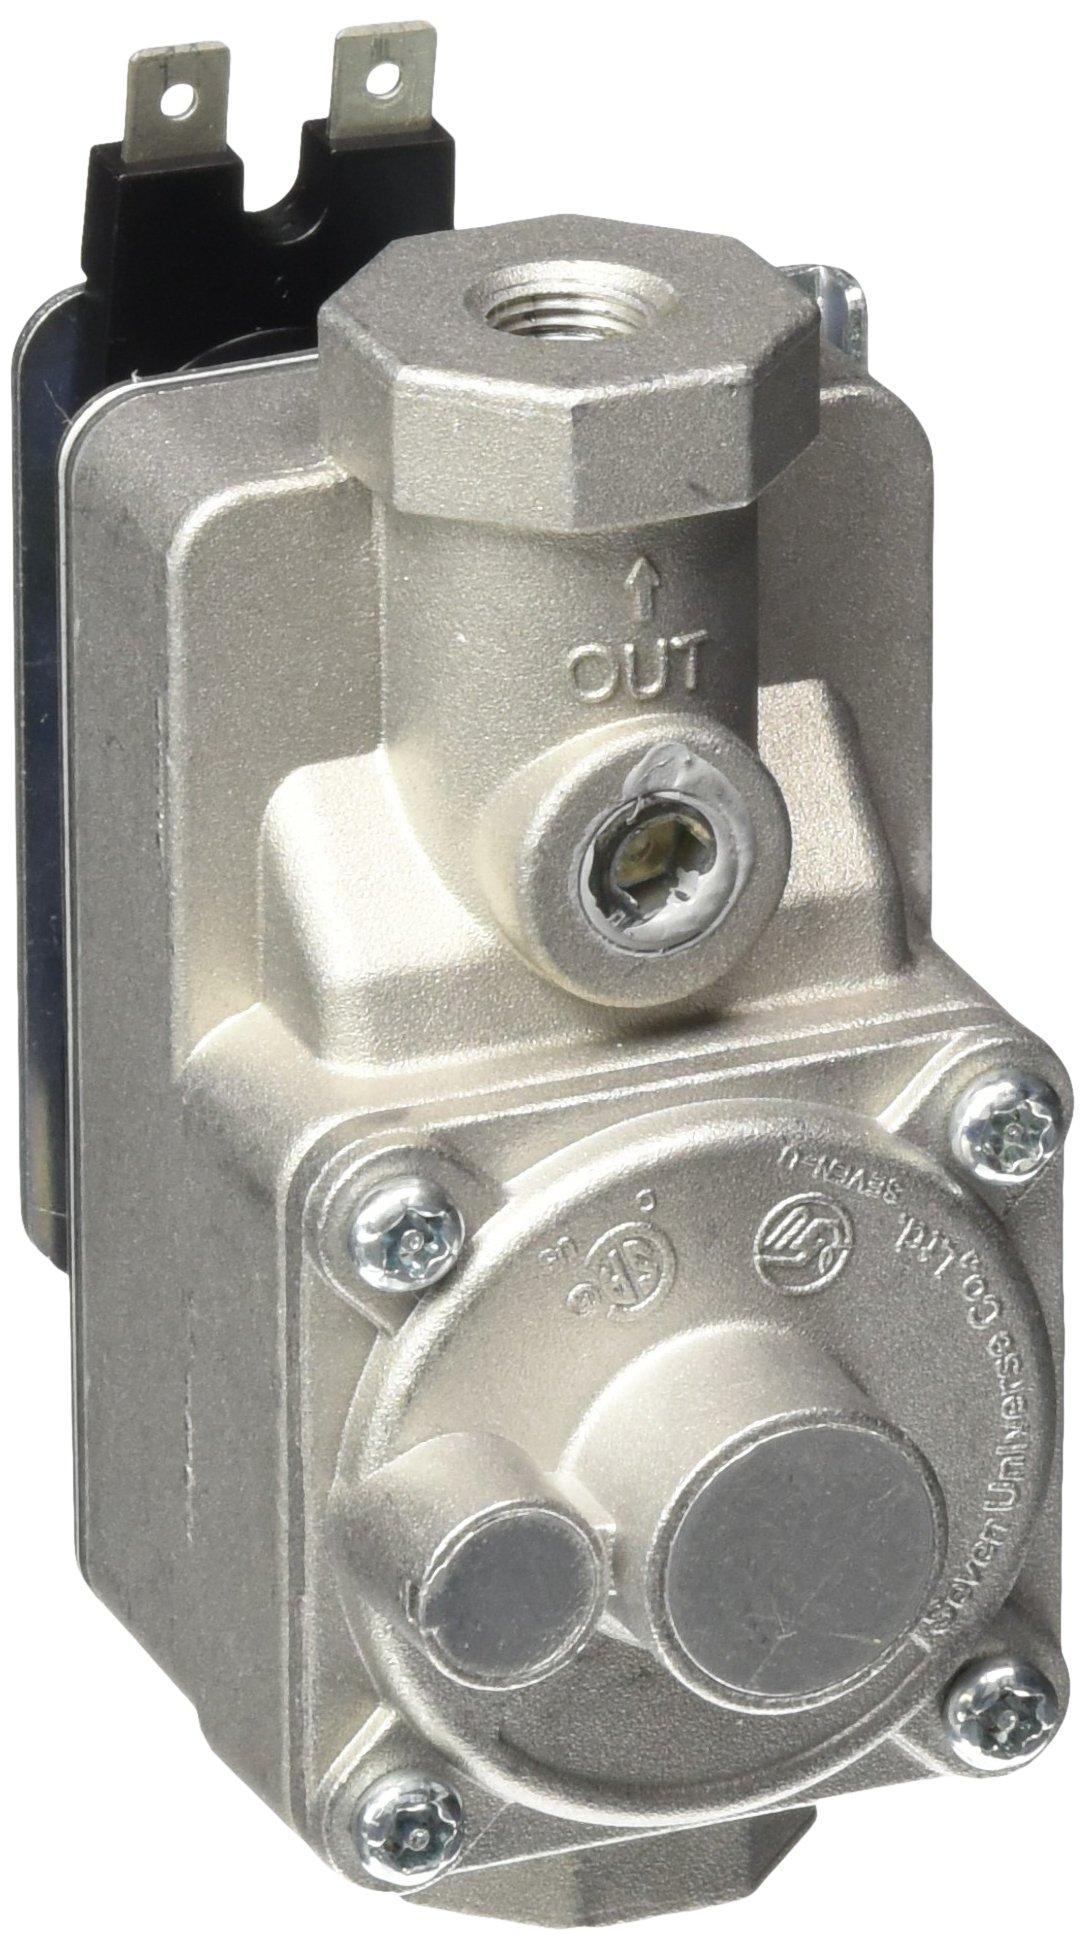 Suburban (161123 12V DC Gas Valve for Furnace by Suburban